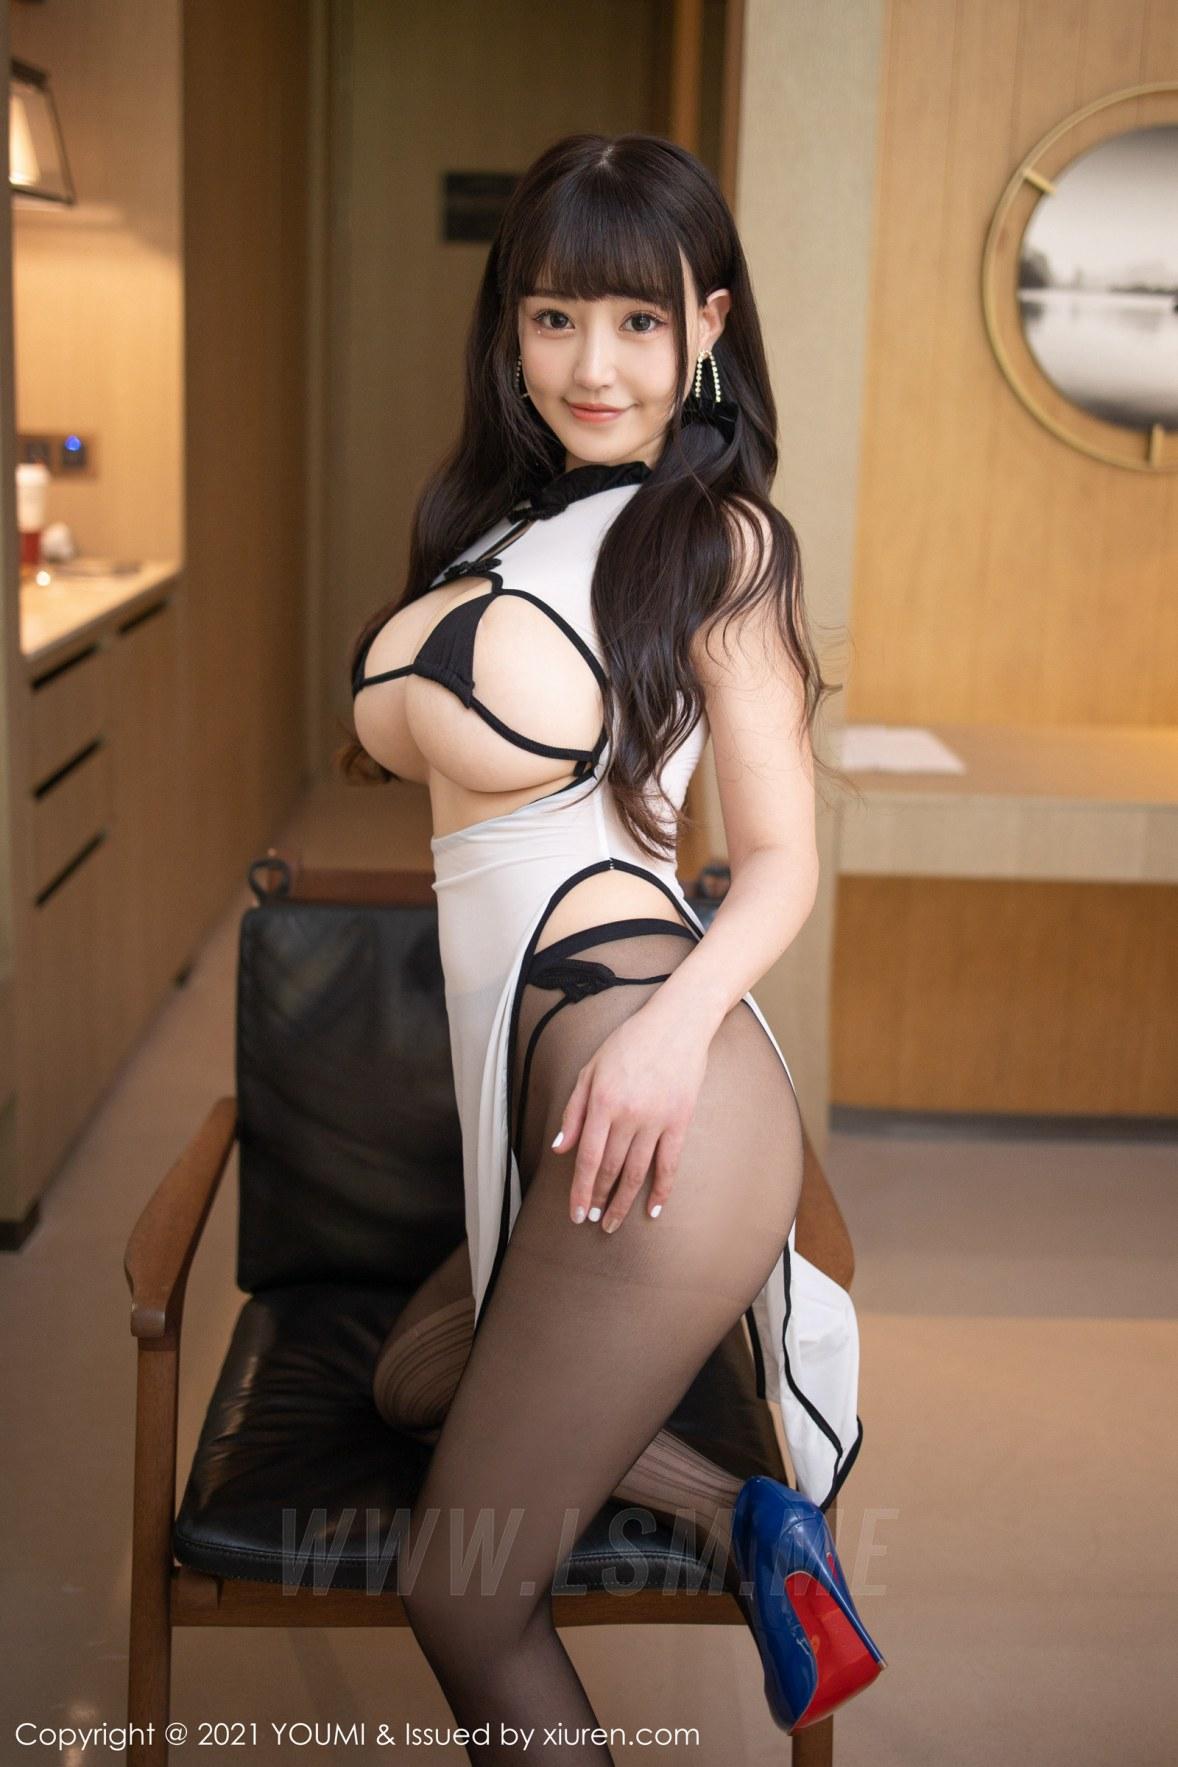 YOUMI 尤蜜荟 Vol.686 白色旗袍 朱可儿Flower 桂林旅拍11 - 4